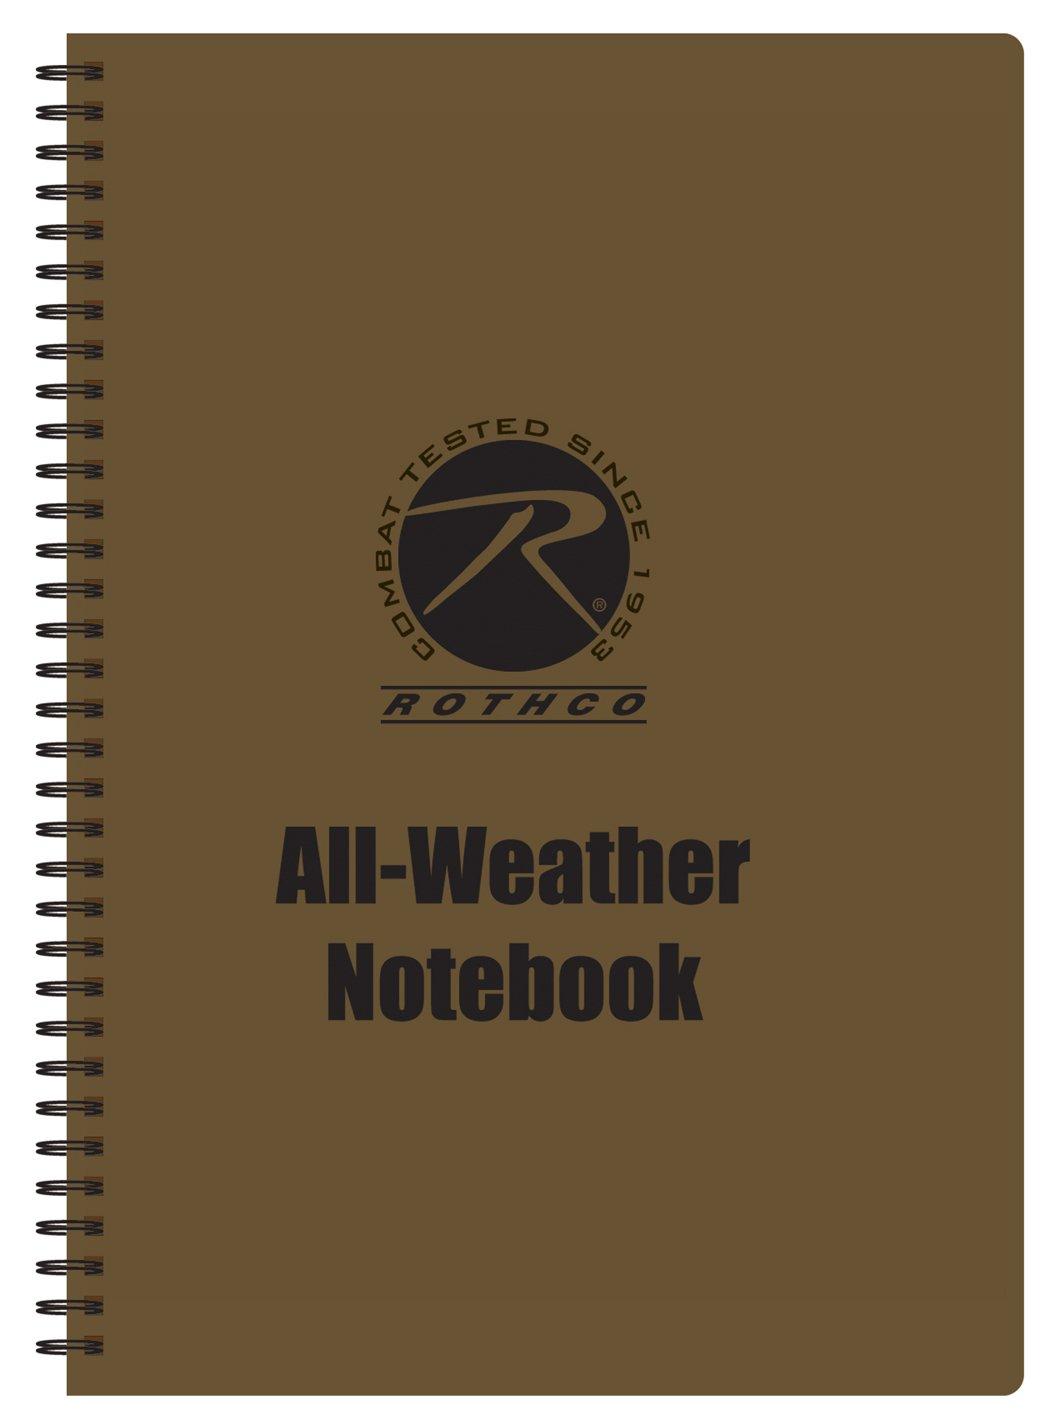 Rothco alle Wetter Wasserdicht Notebook